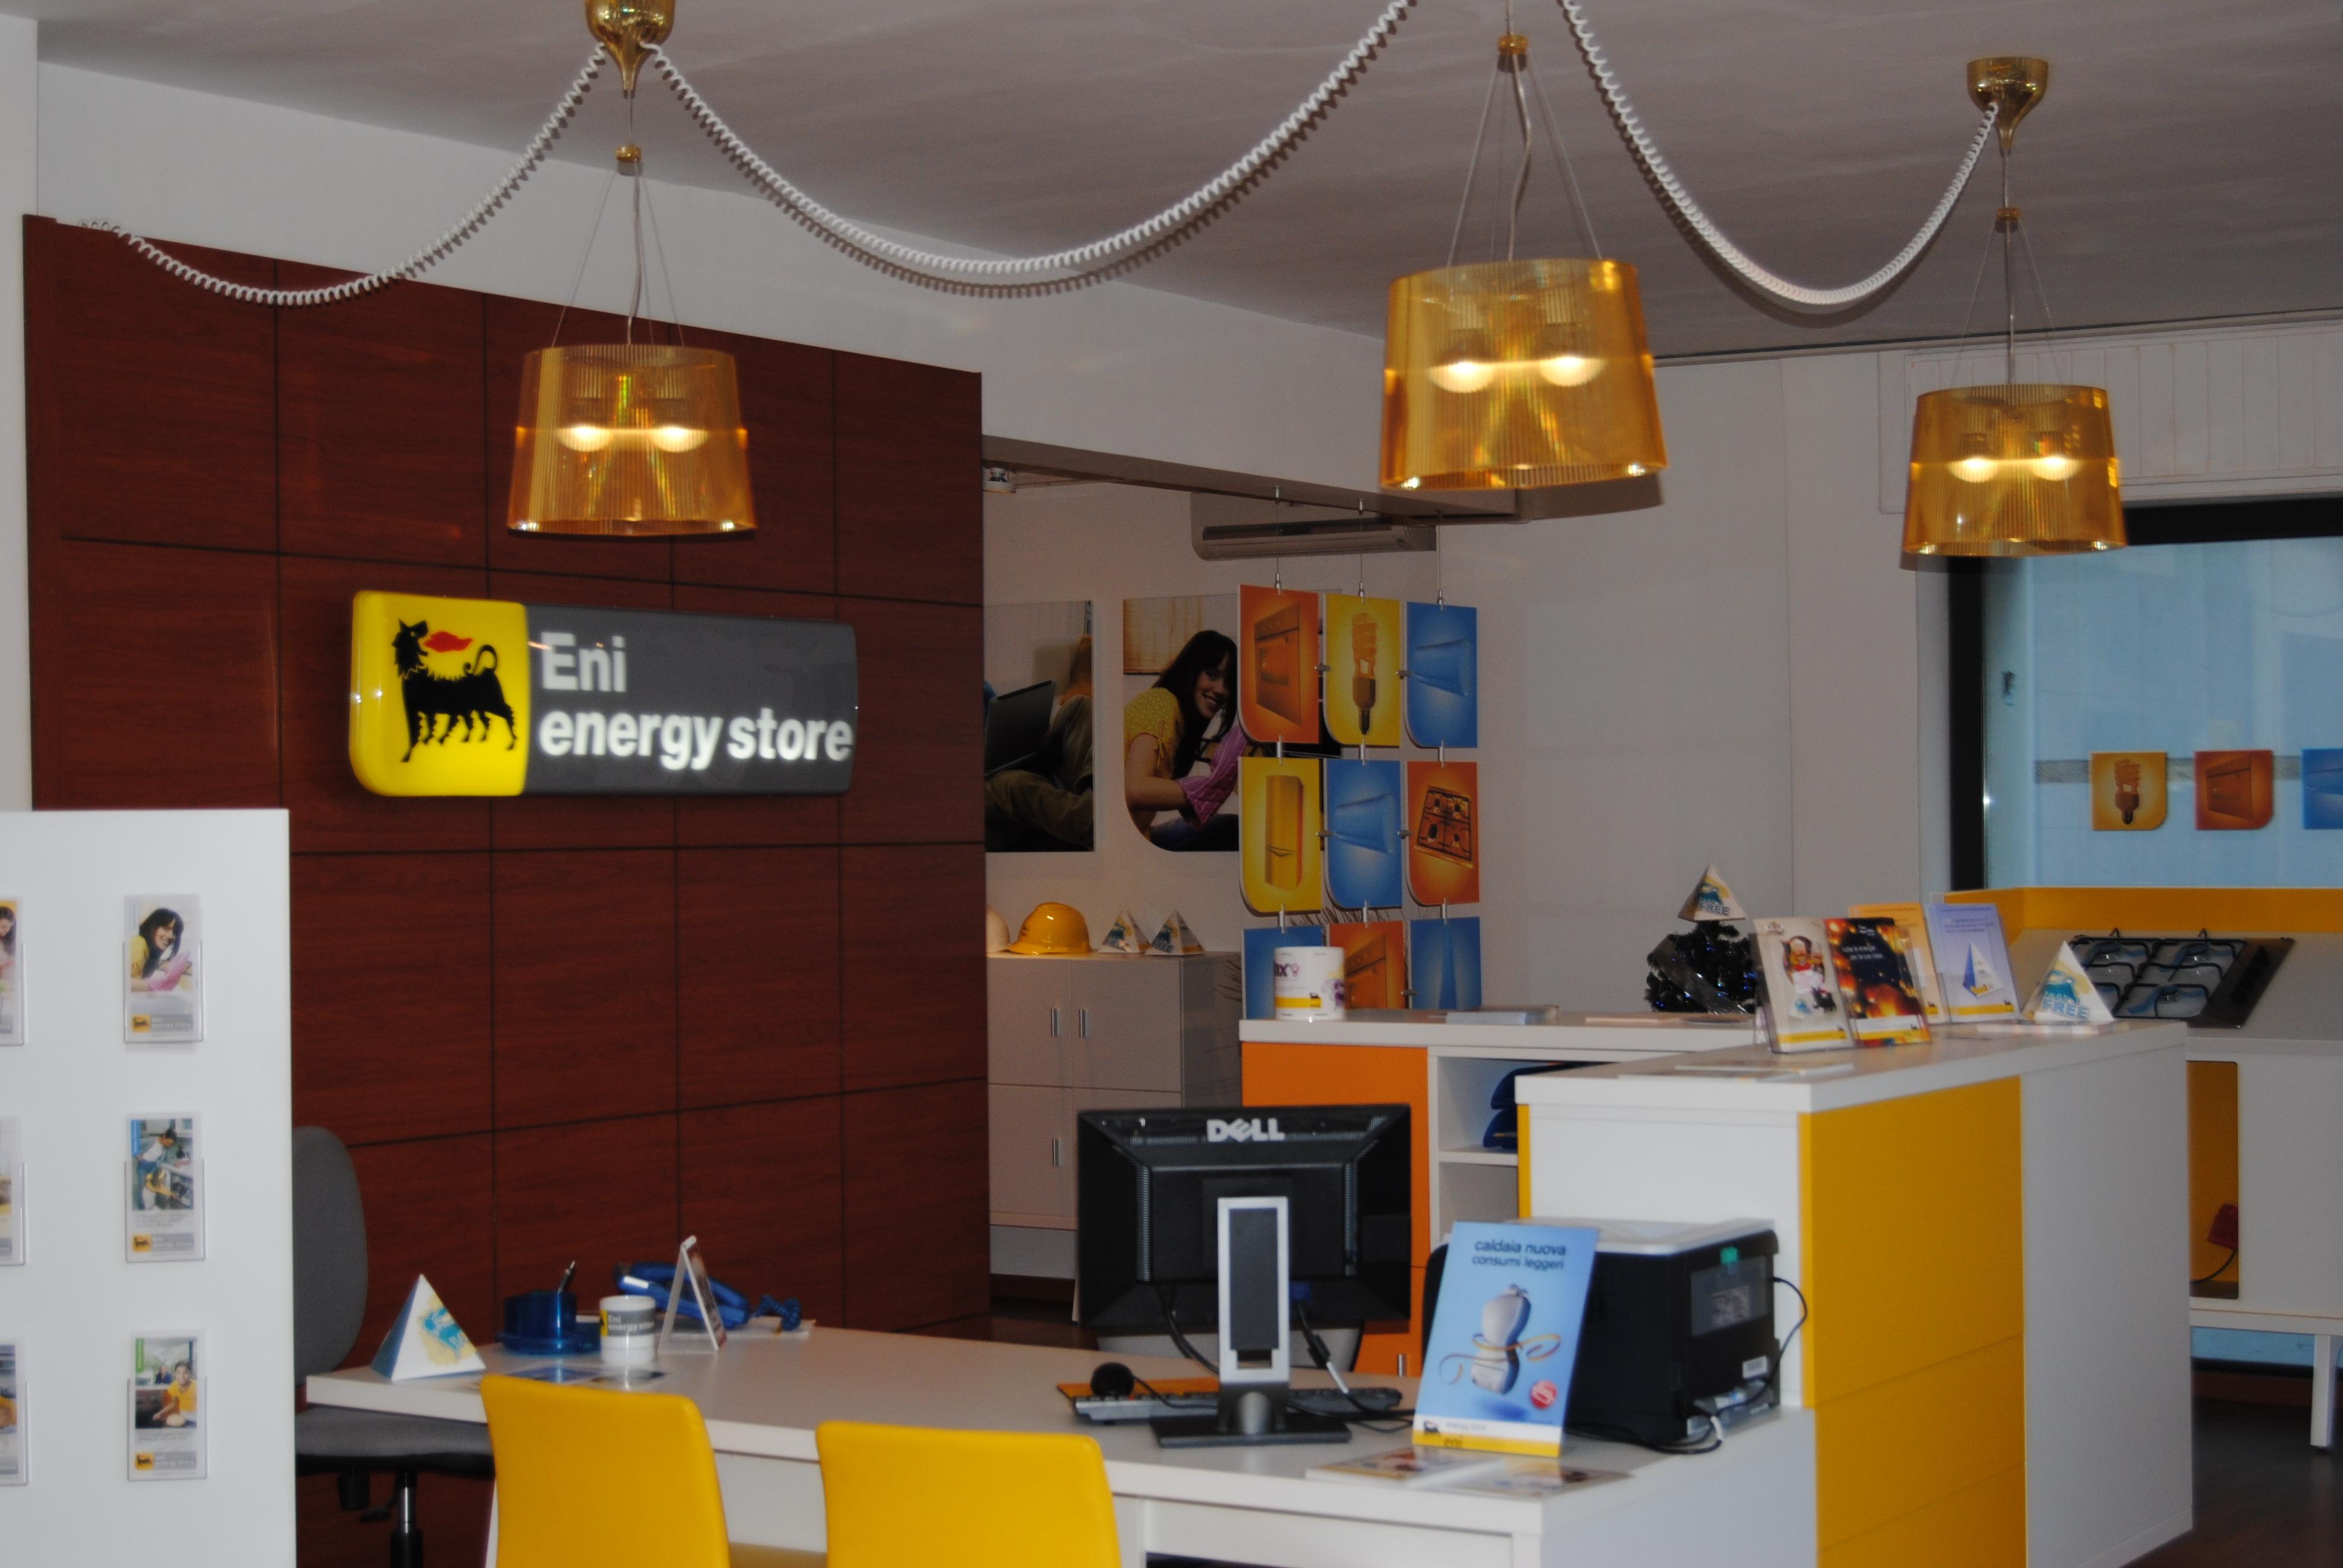 Energy Store Eni